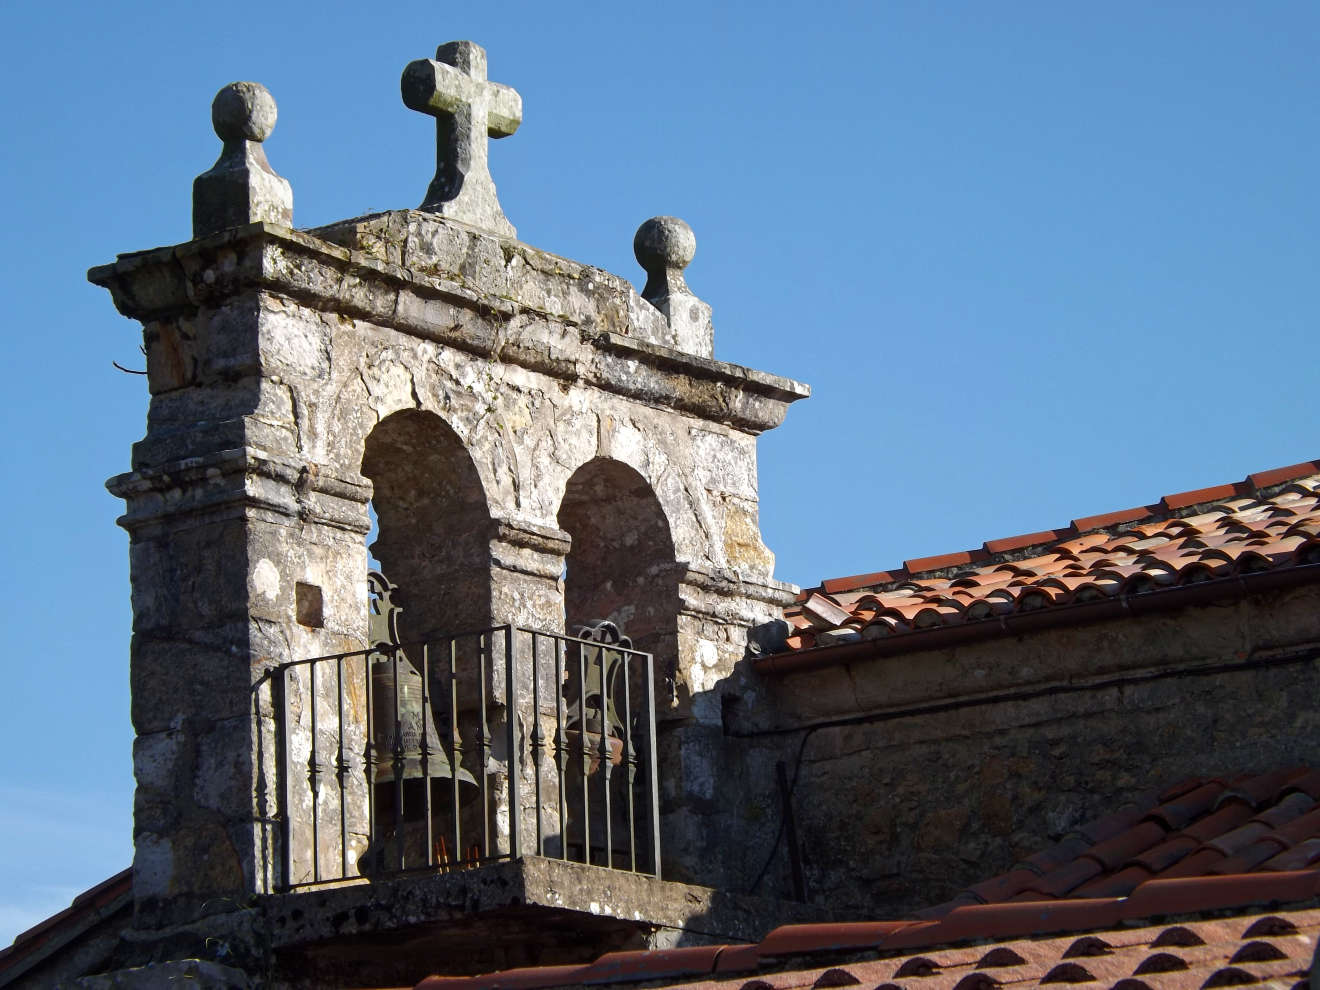 Campanario la iglesia de Santa Eulalia